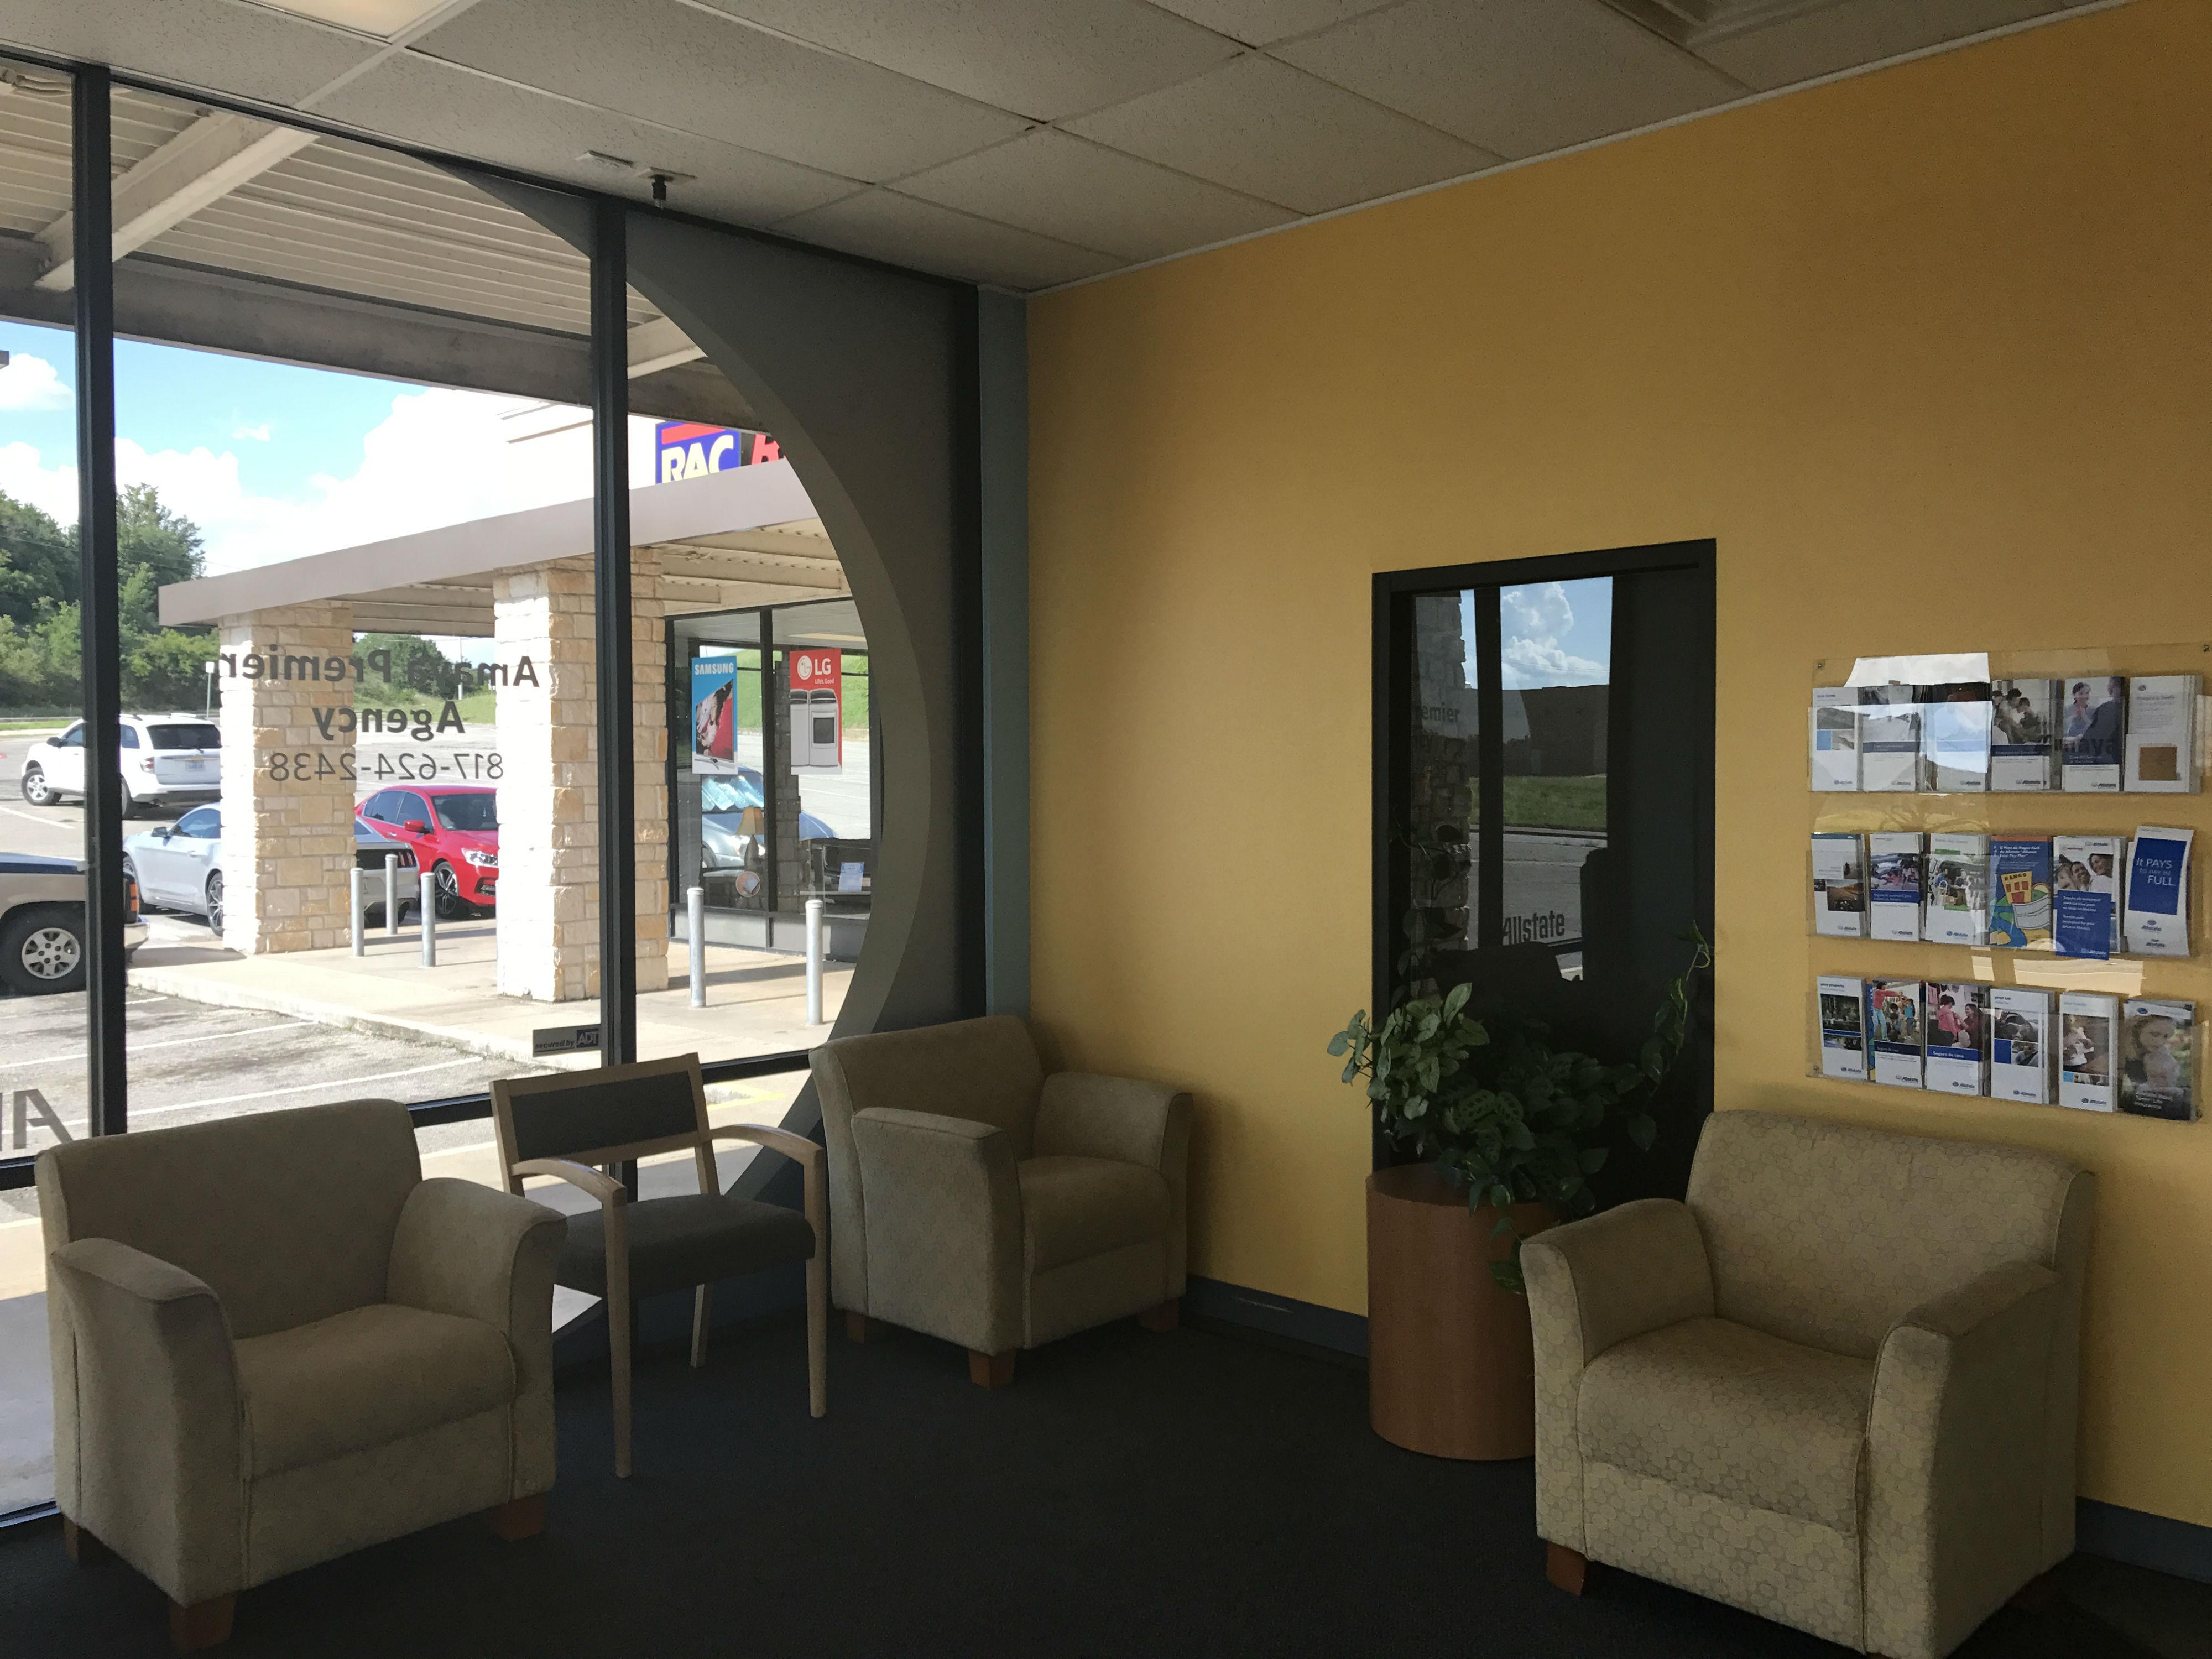 Maria Amaya: Allstate Insurance image 3